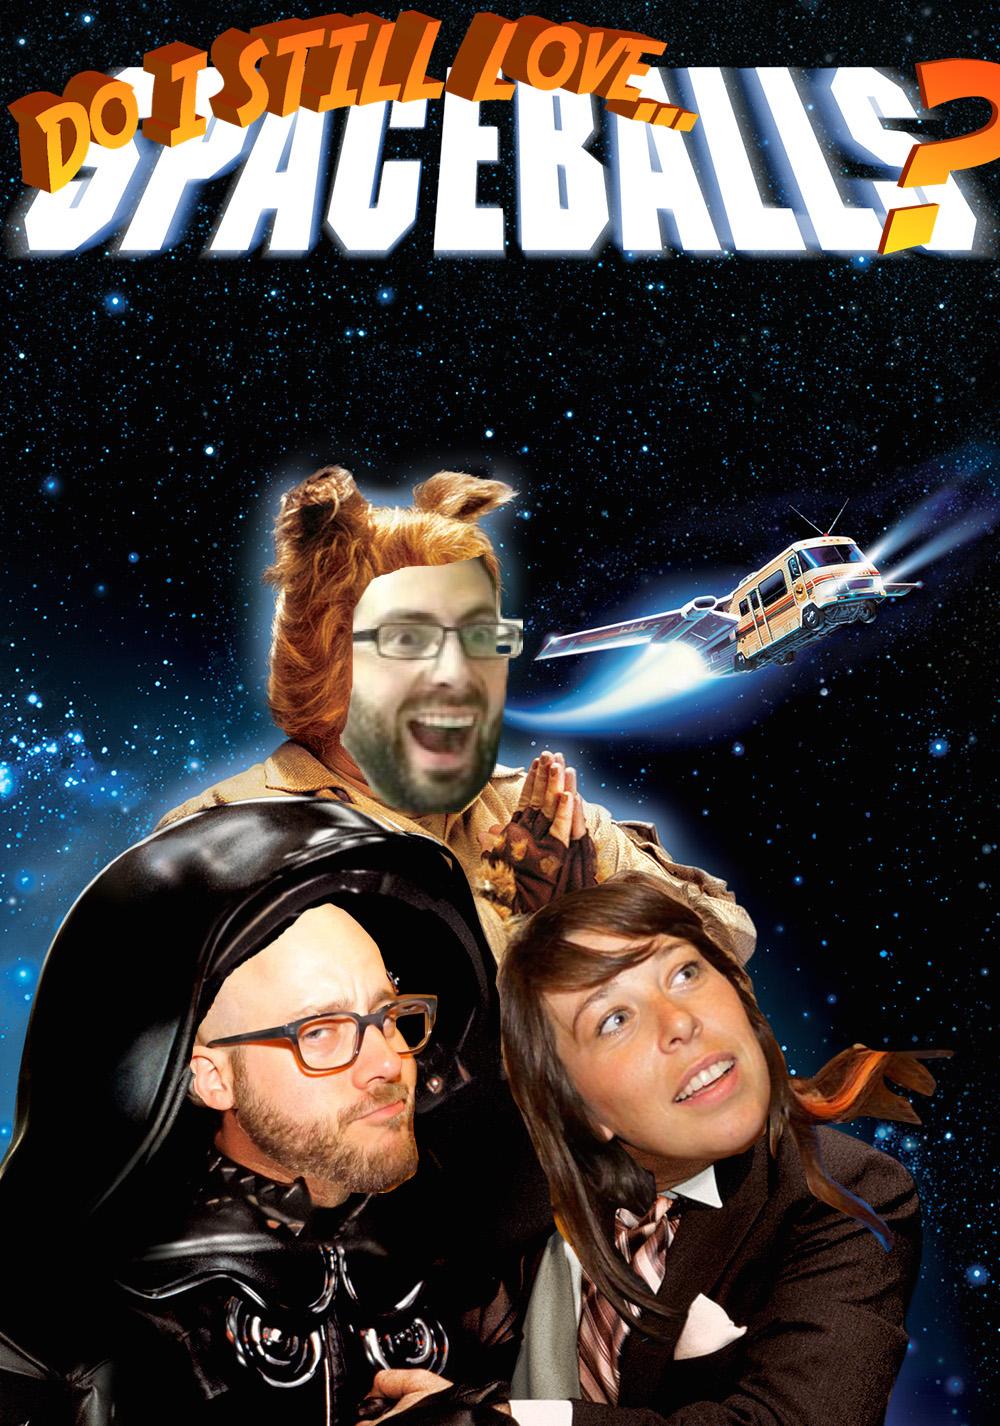 disl_spaceballs